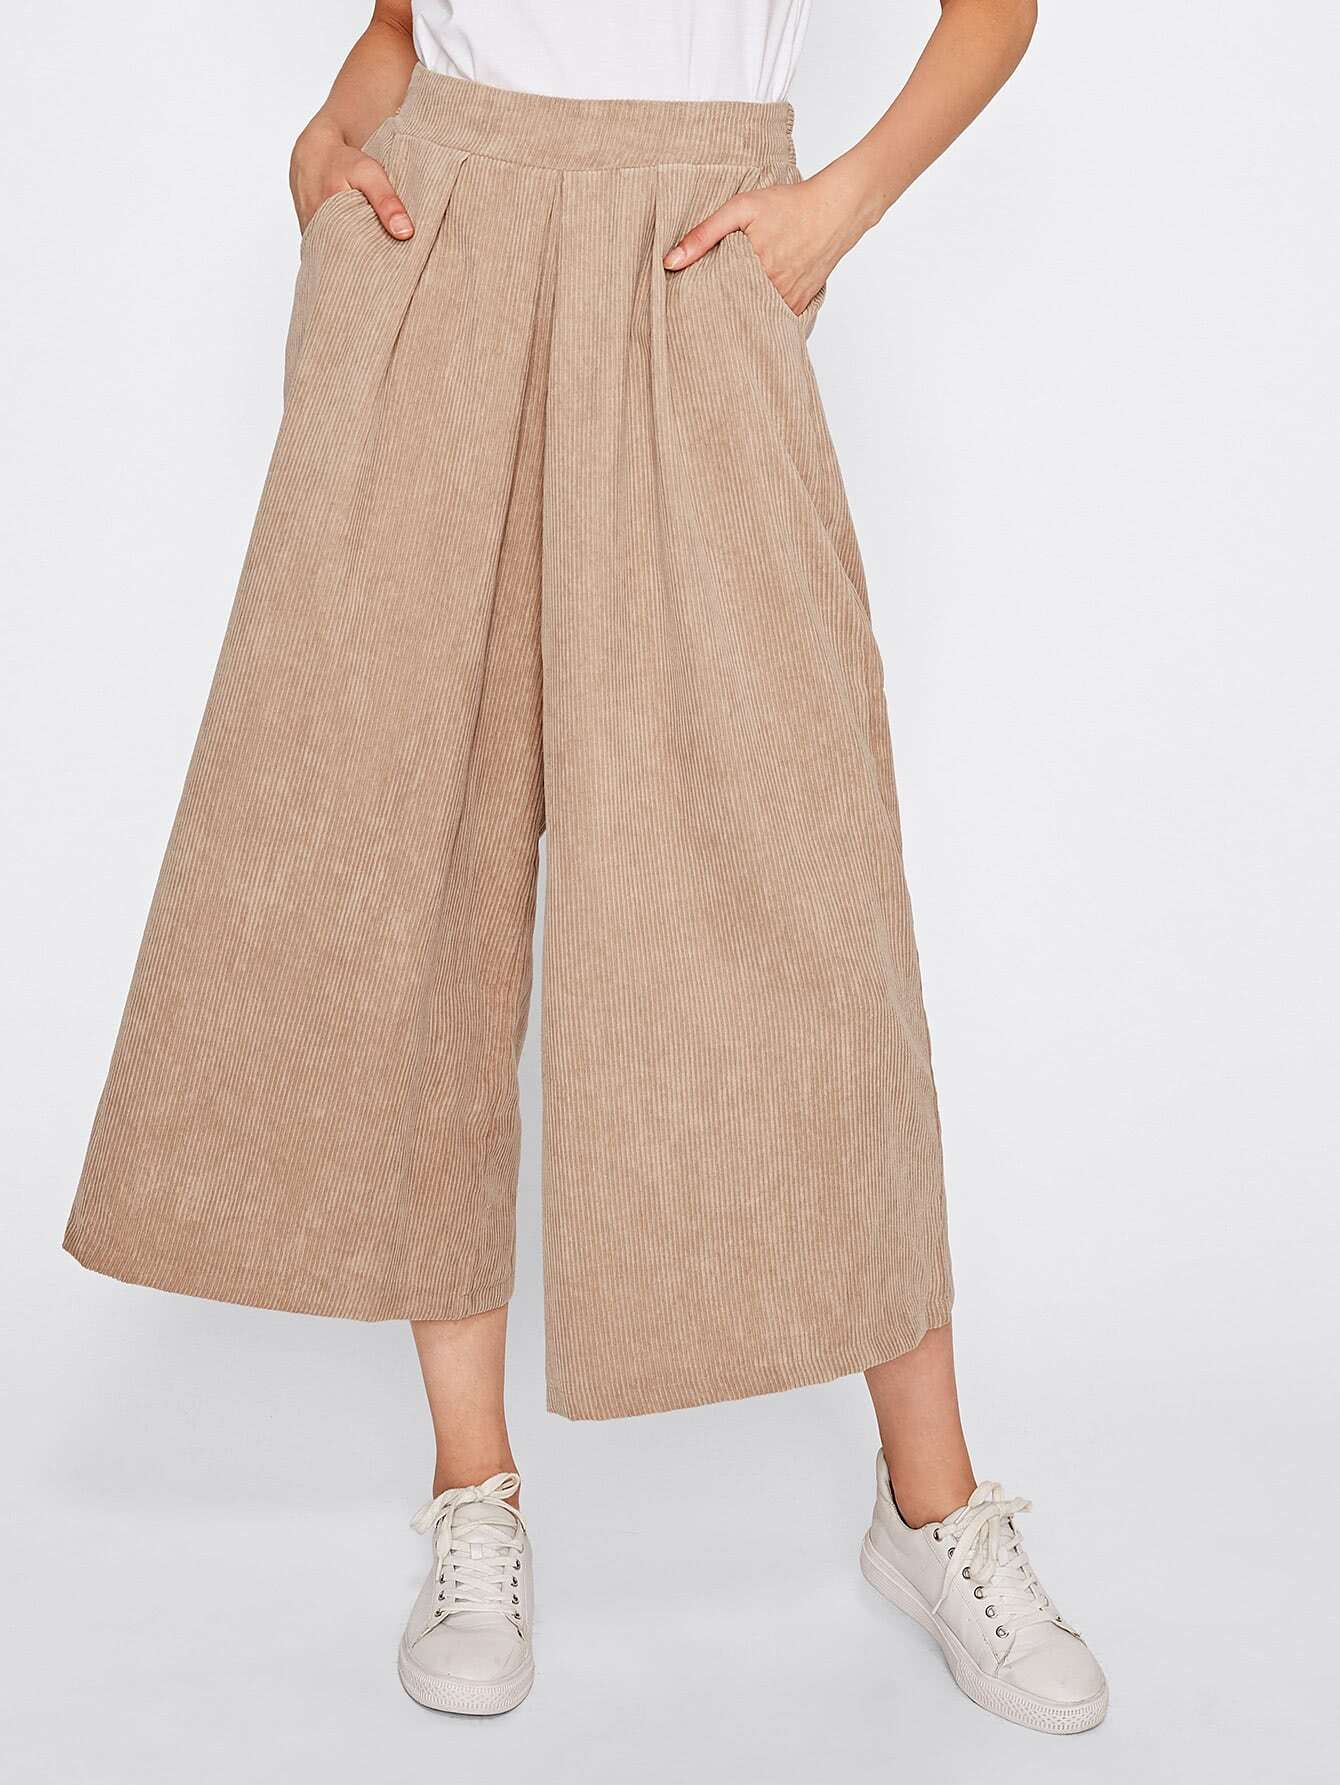 Ribbed Wide Leg Corduroy Pants pants170823030